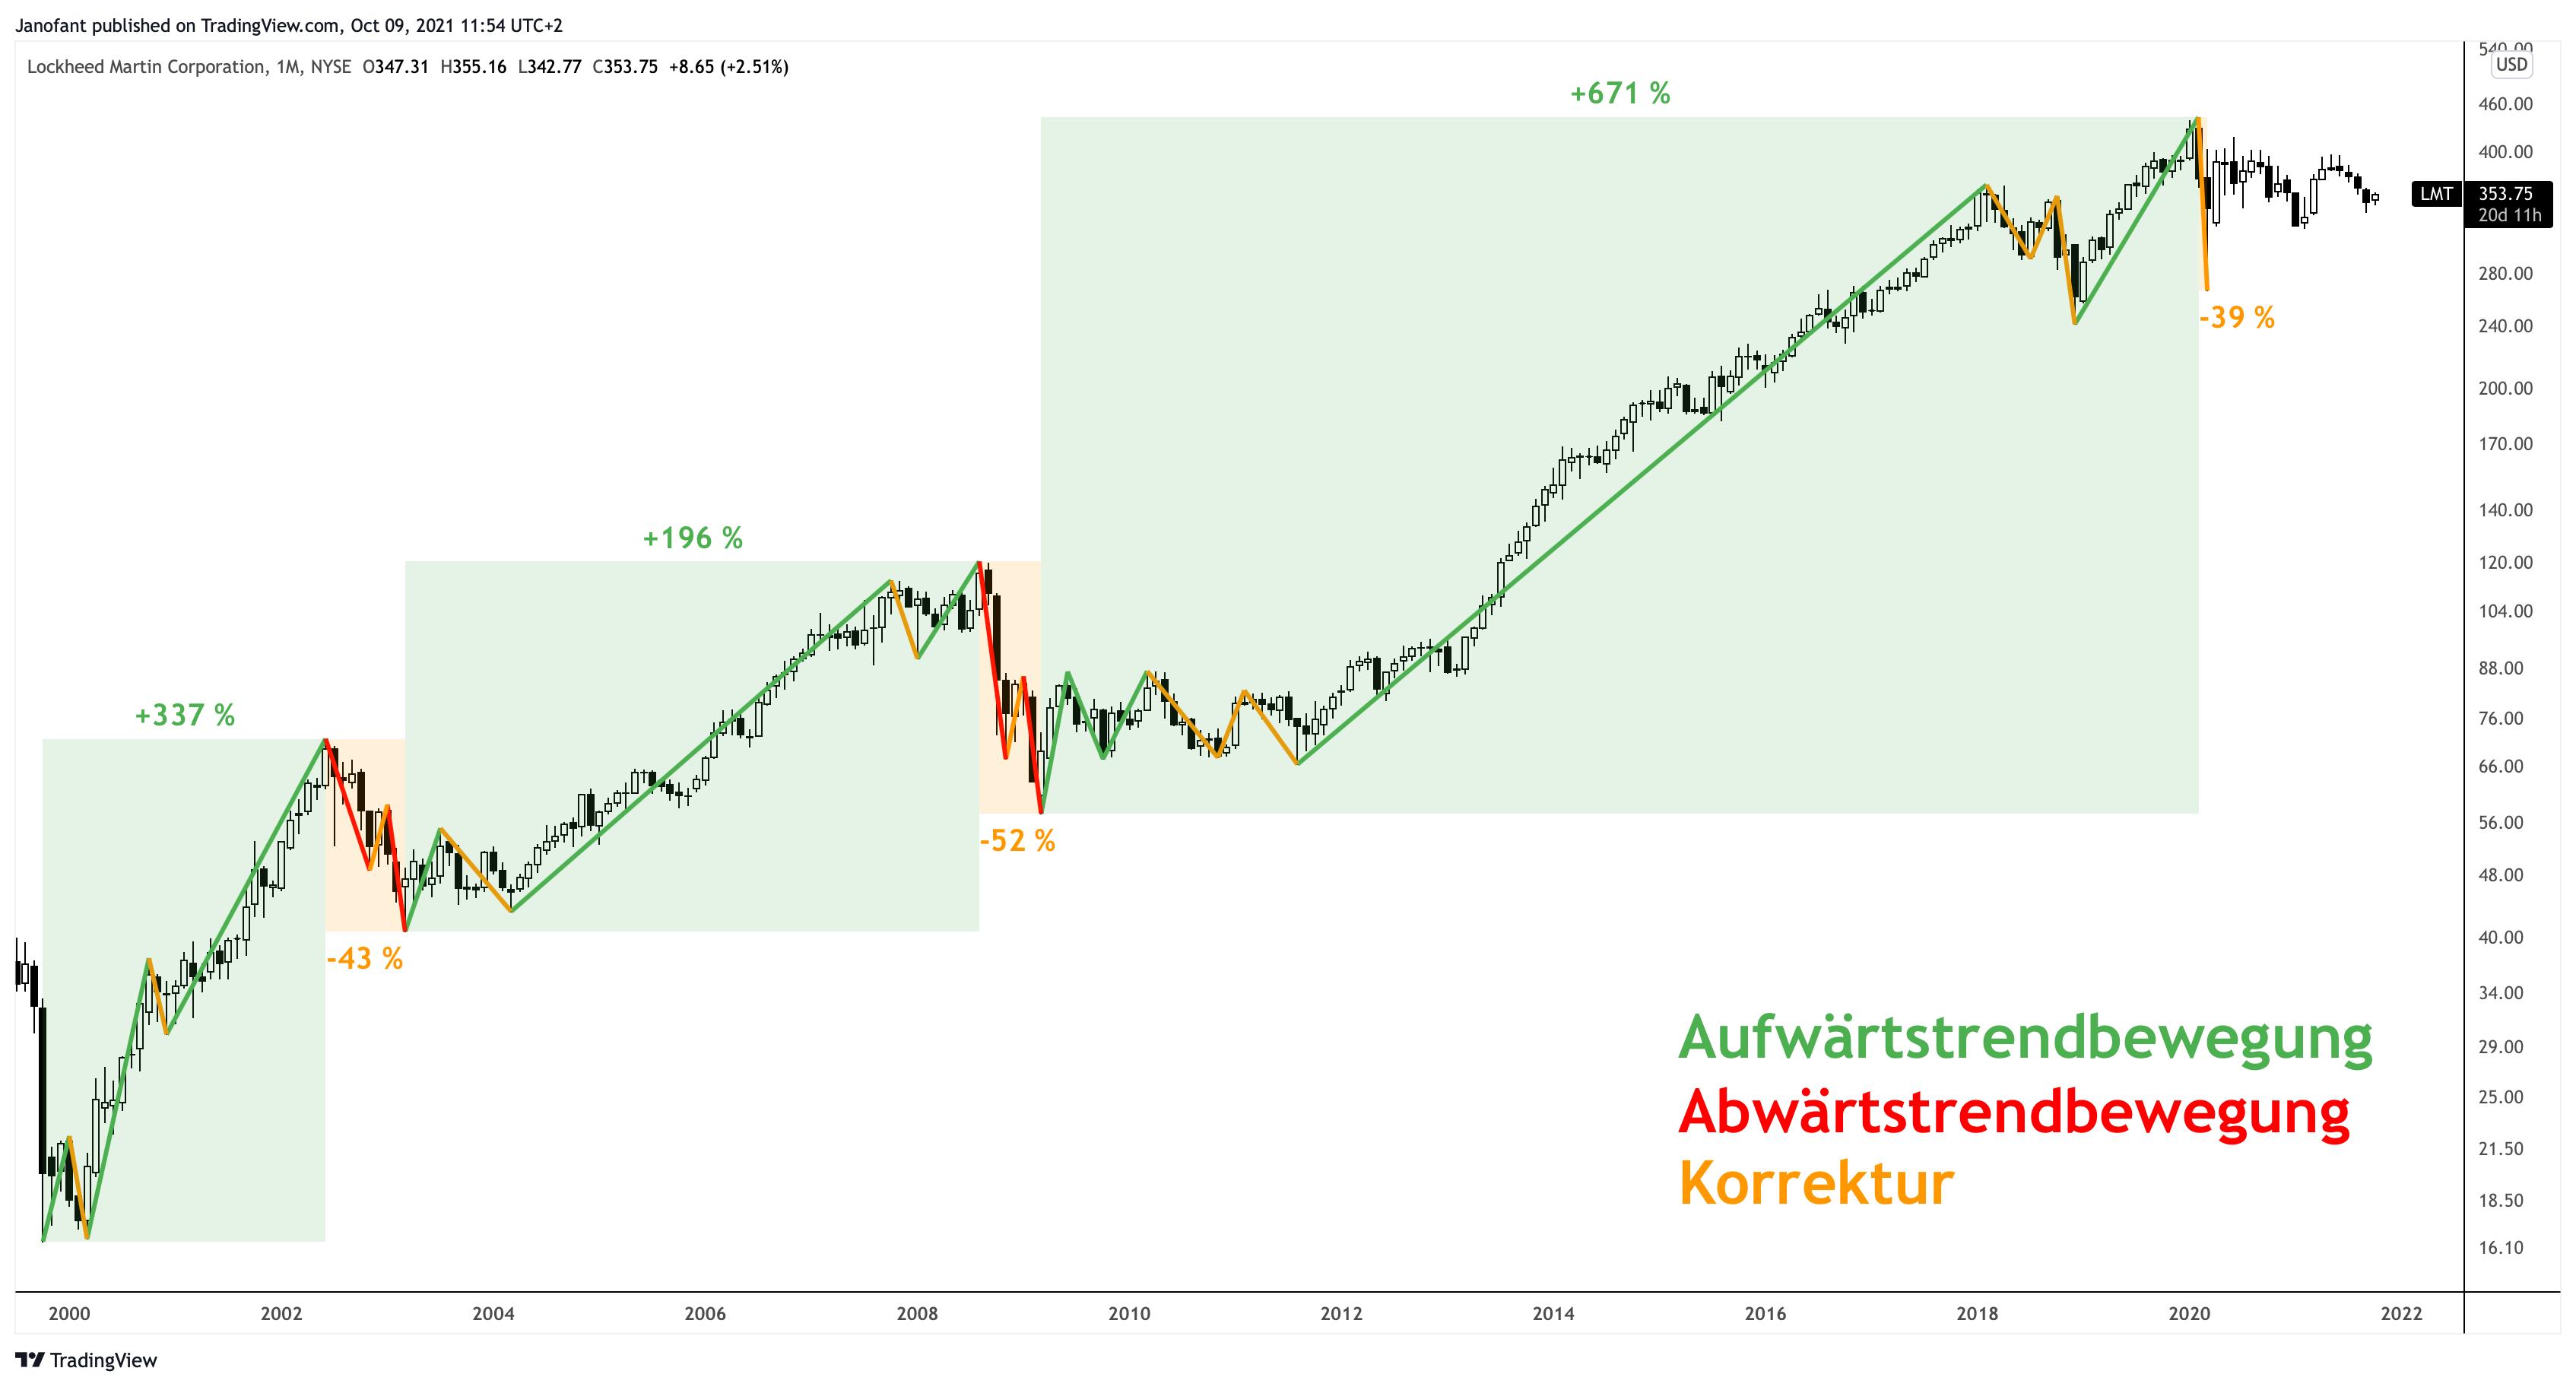 Lockheed Martin Aktie Analyse langfristig